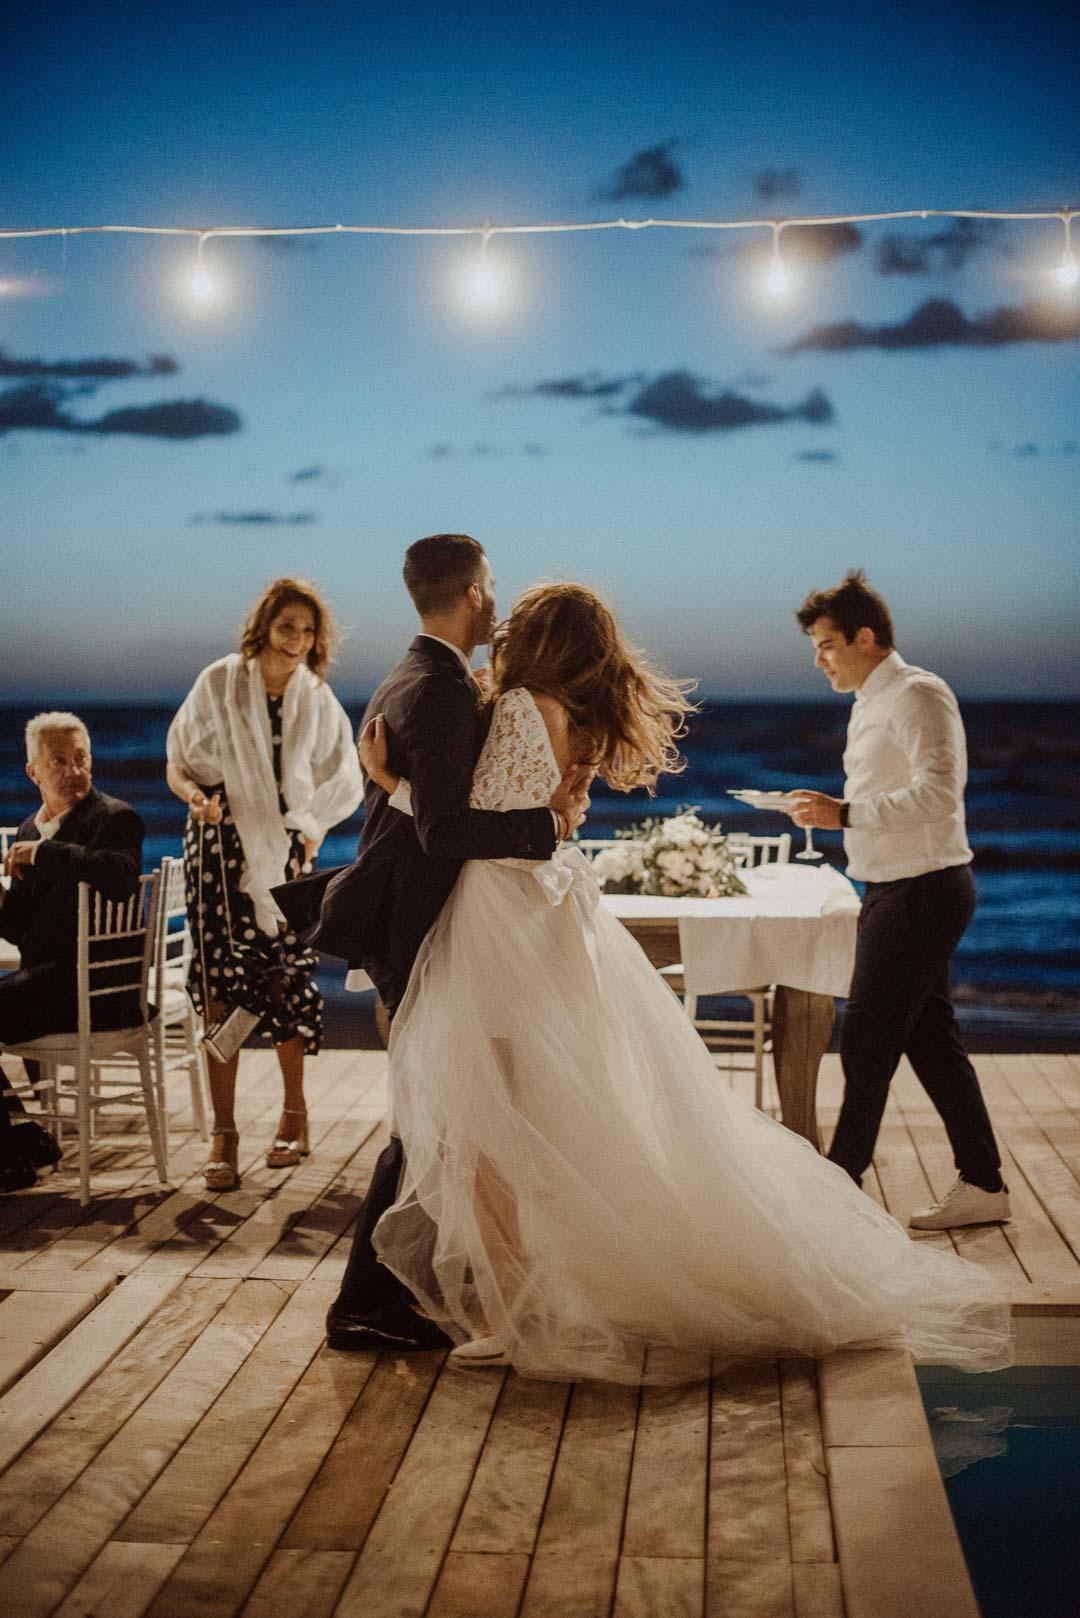 wedding-photographer-destination-fineart-bespoke-reportage-napoli-nabilah-vivianeizzo-spazio46-157